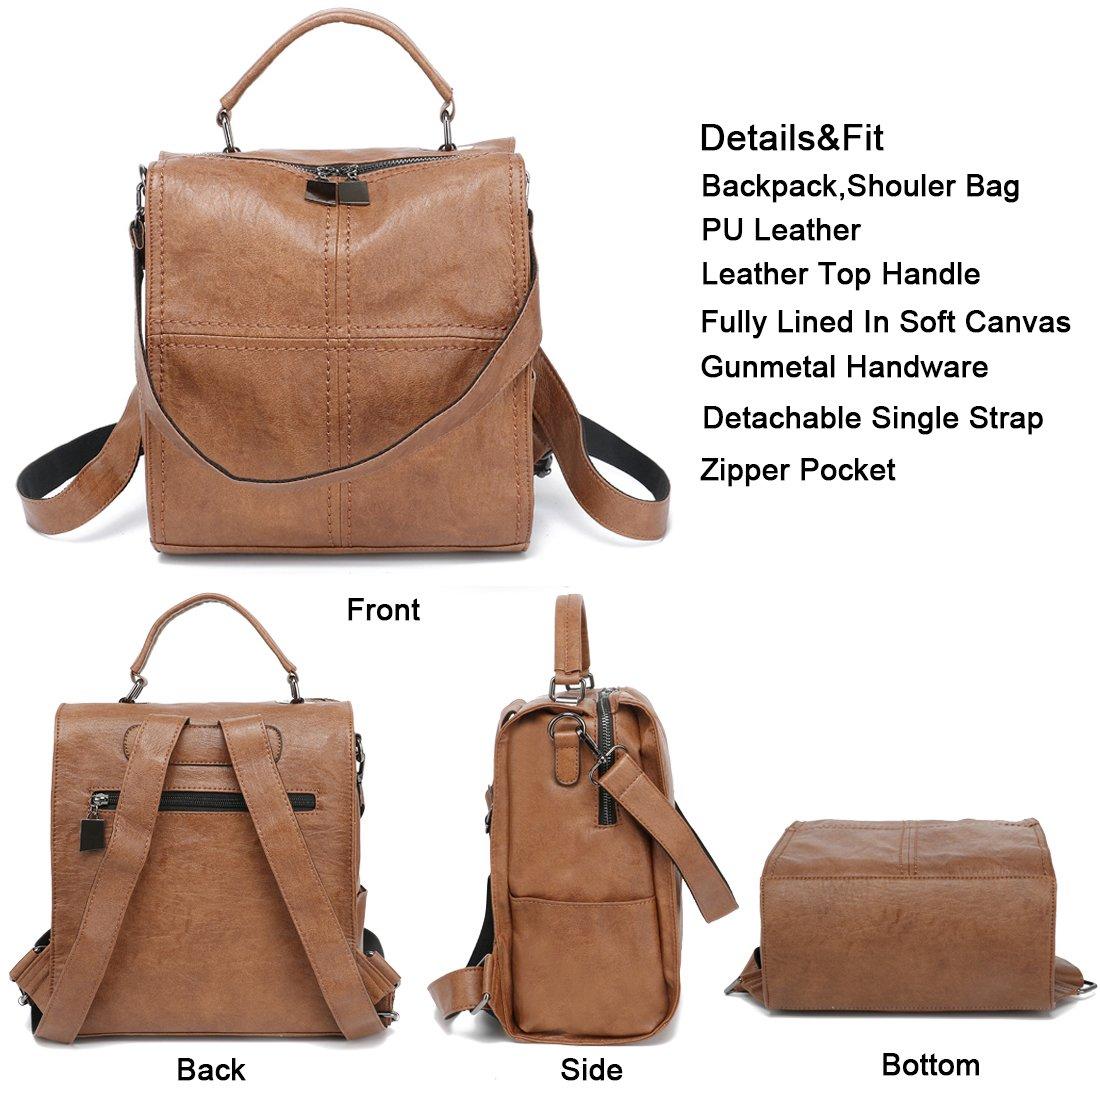 Red Cute Women Backpack Purse PU Leather Mini Convertible Shoulder Bag Square Rucksack Handbag Purse Vintage Satchel Bags